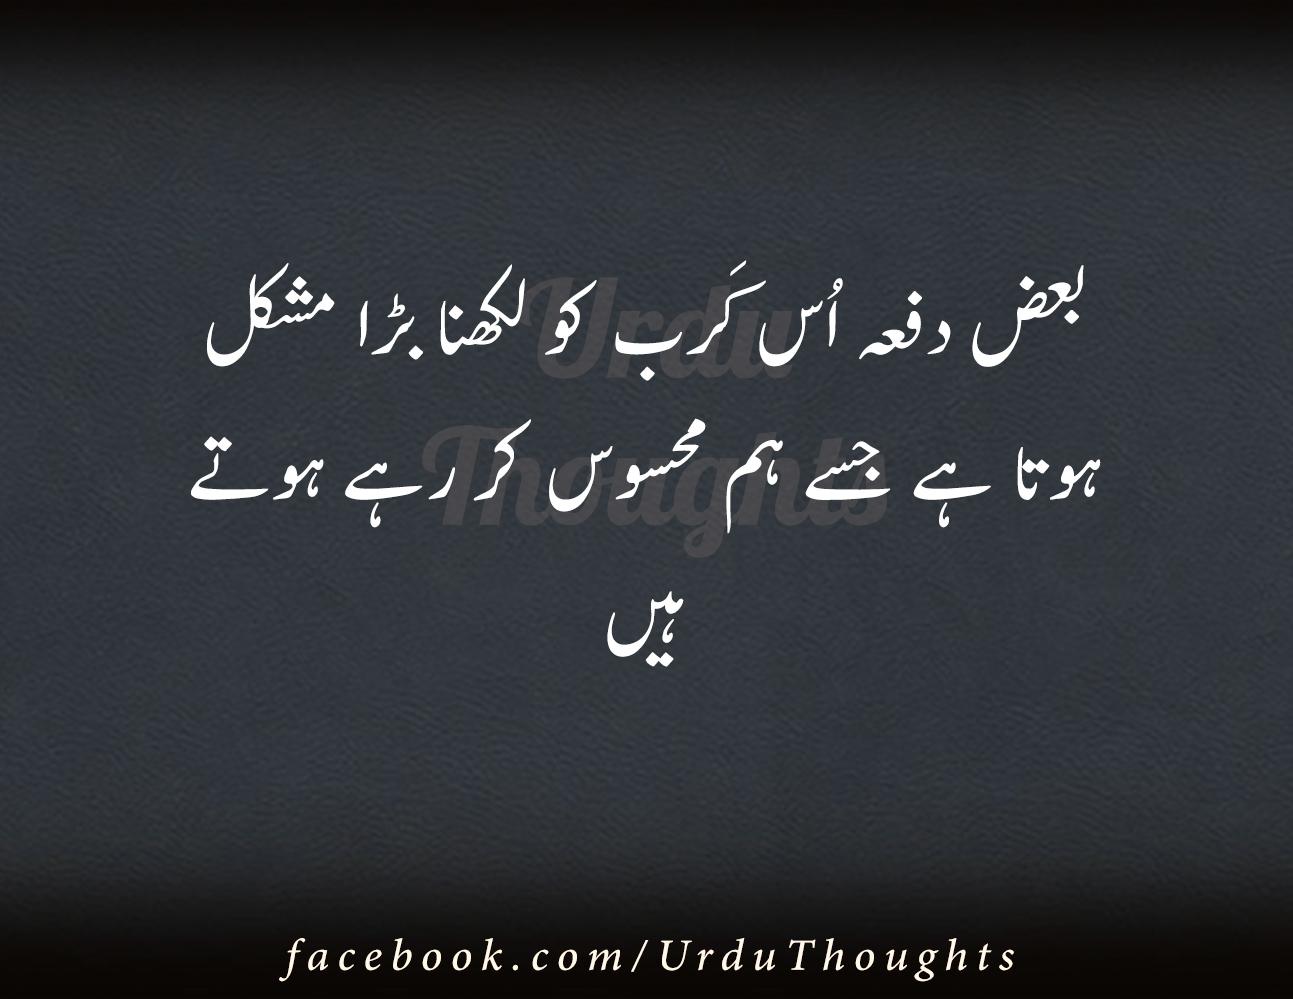 Beautiful Quotes Images In Urdu | Bestpicture1 org